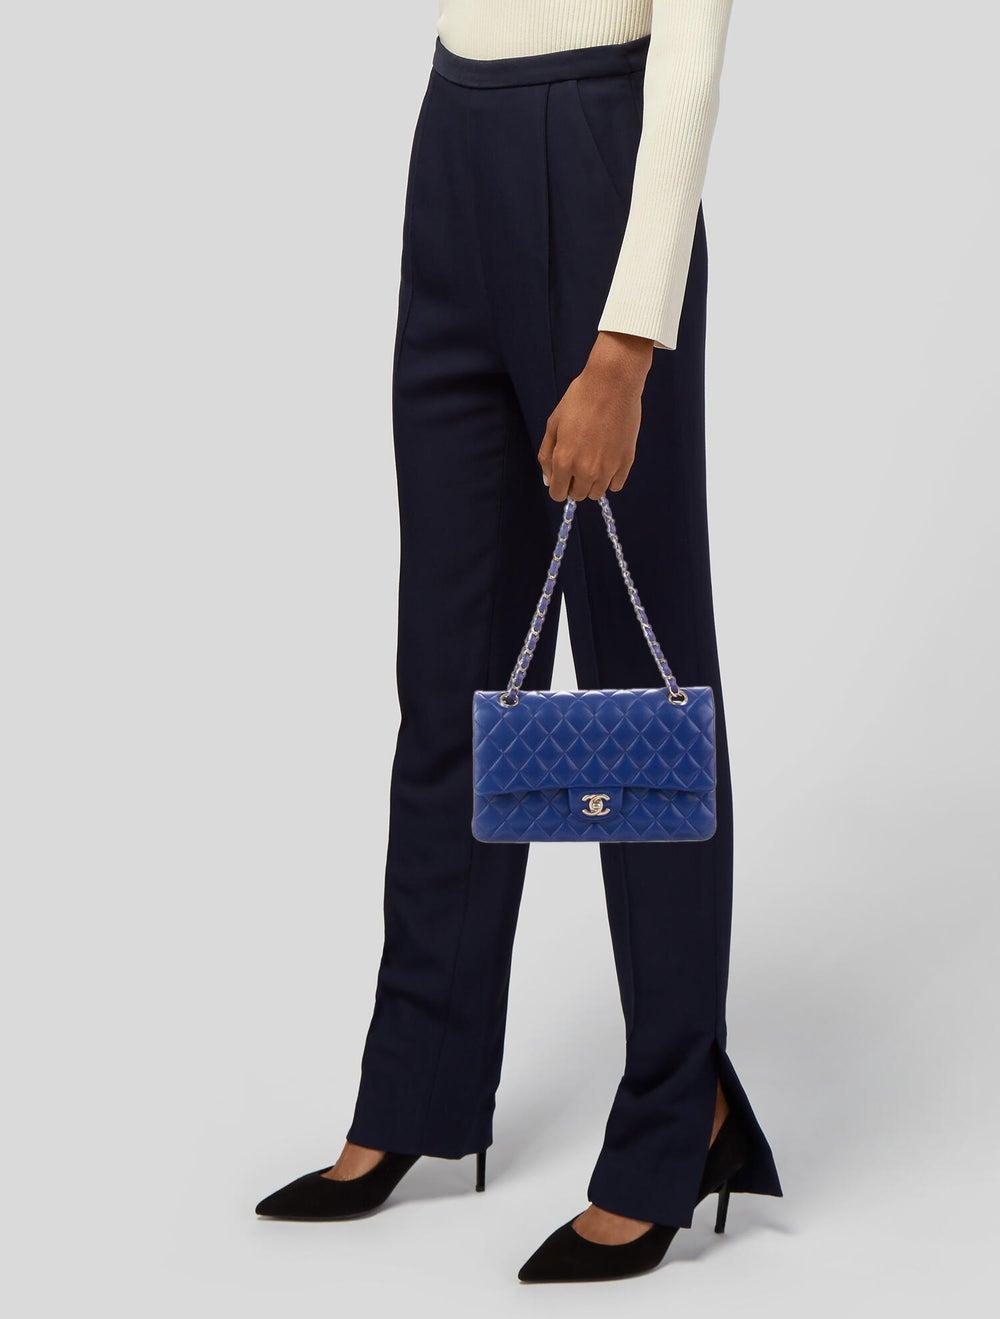 Chanel Medium Classic Double Flap Bag Blue - image 2